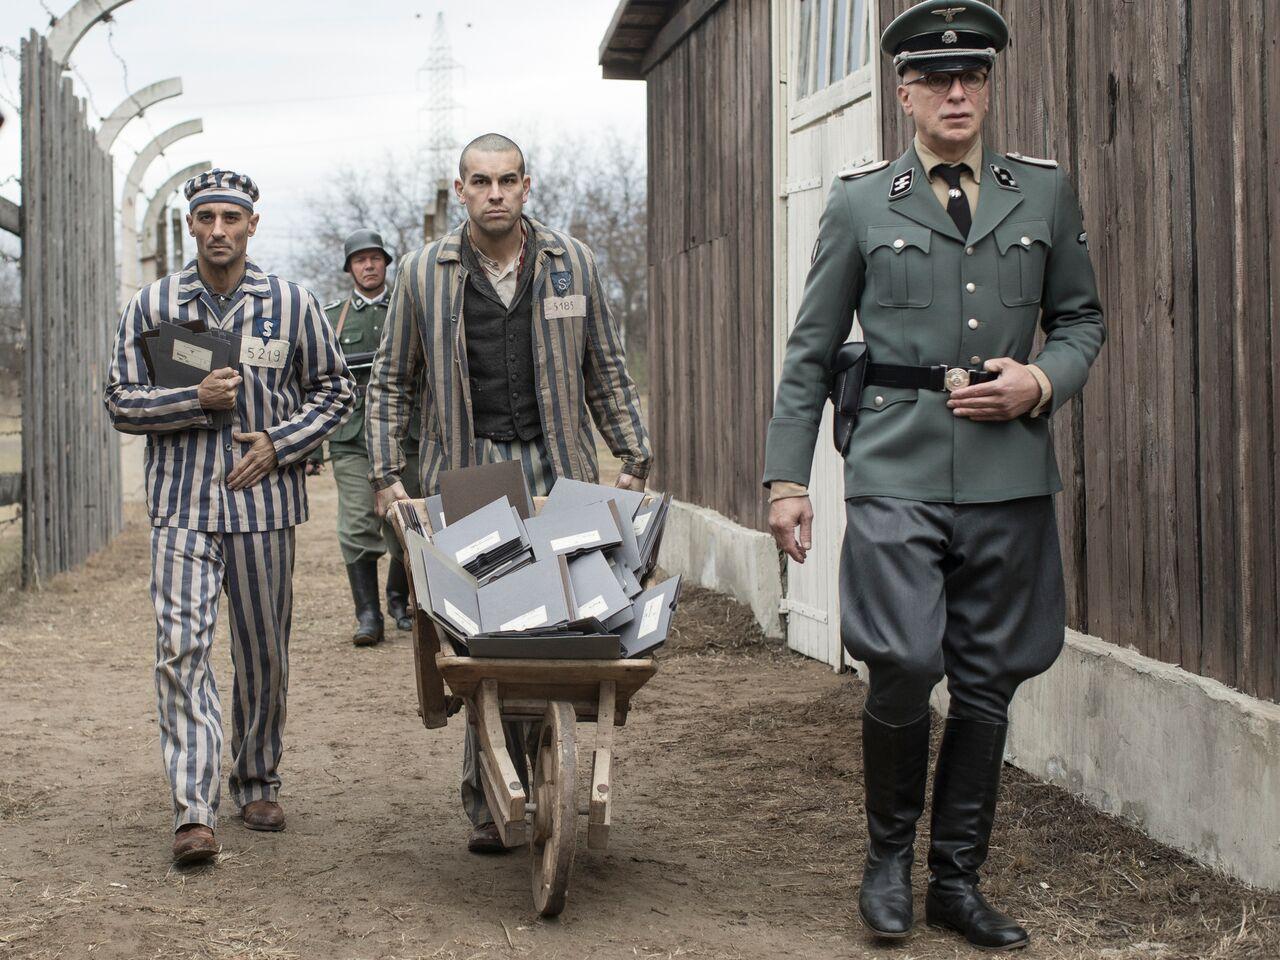 fotografo mauthausen